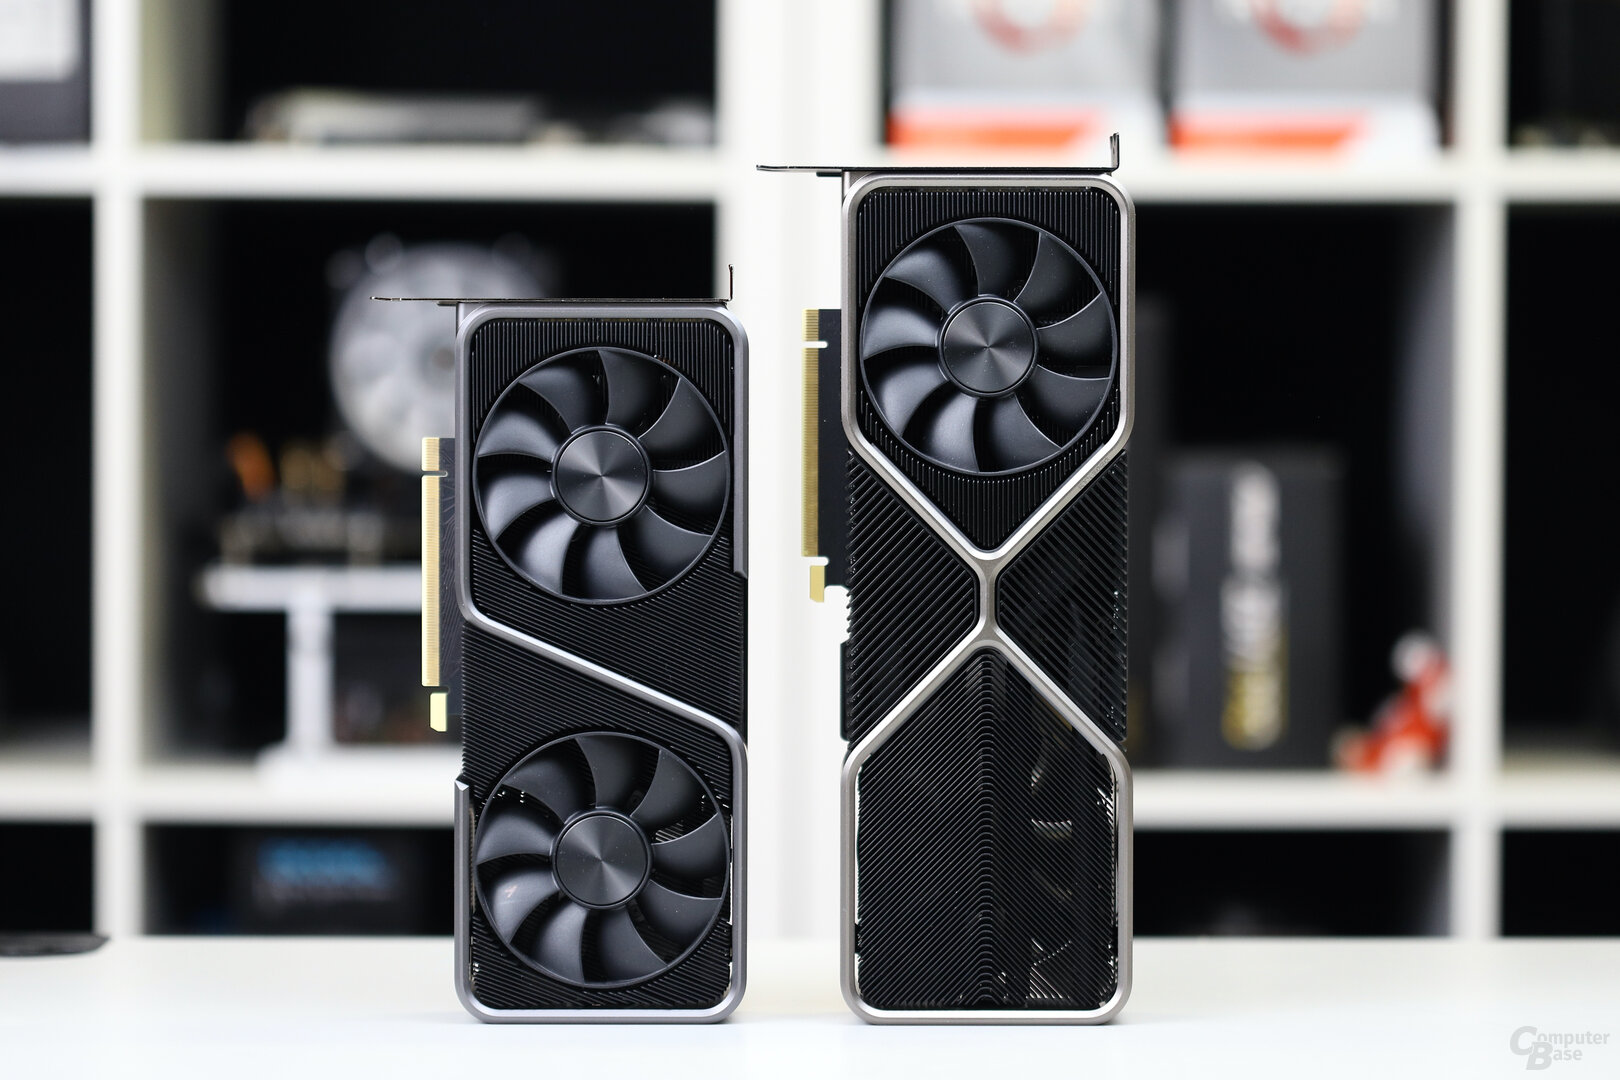 Nvidia GeForce RTX 3070 FE (links) vs. RTX 3080 FE (rechts)